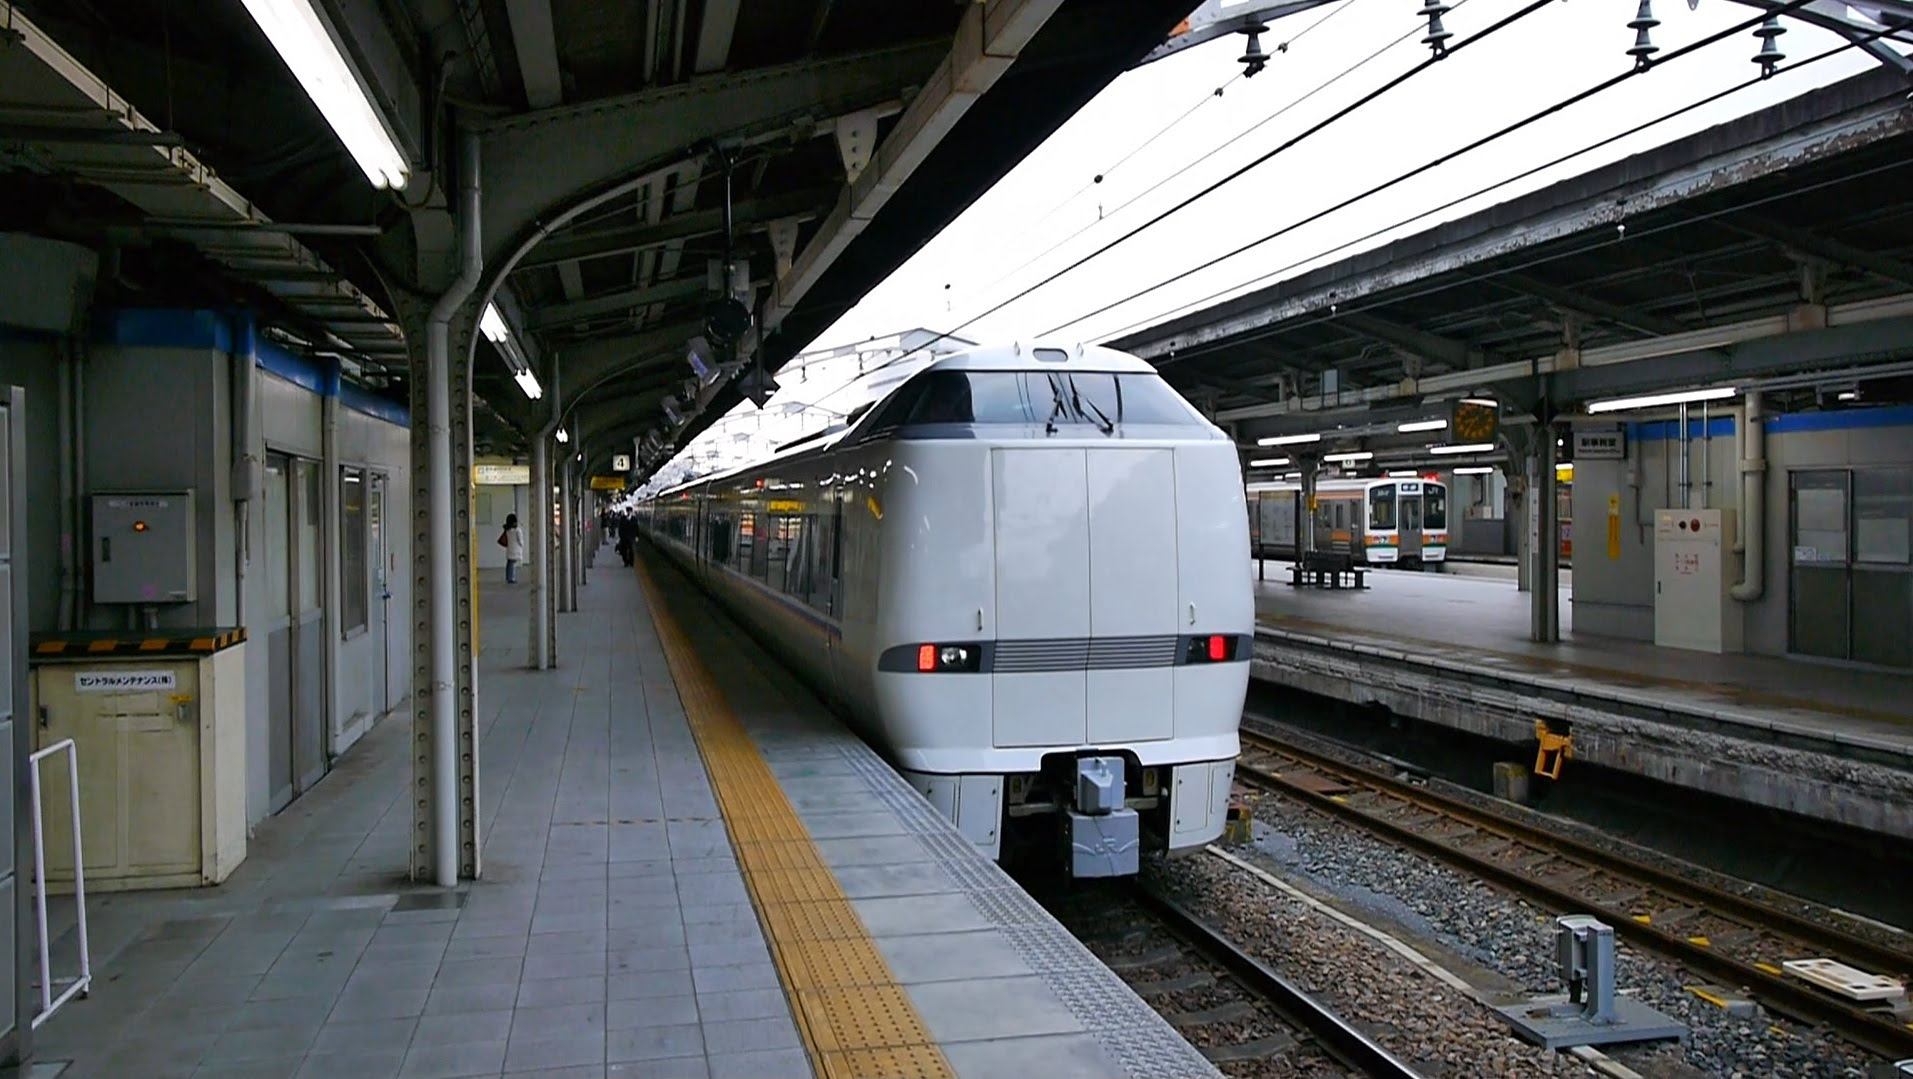 【60fps】JR西日本 特急しらさぎ3号 超広角車窓 米原より進行左側 名古屋~米原~金沢・和倉温泉